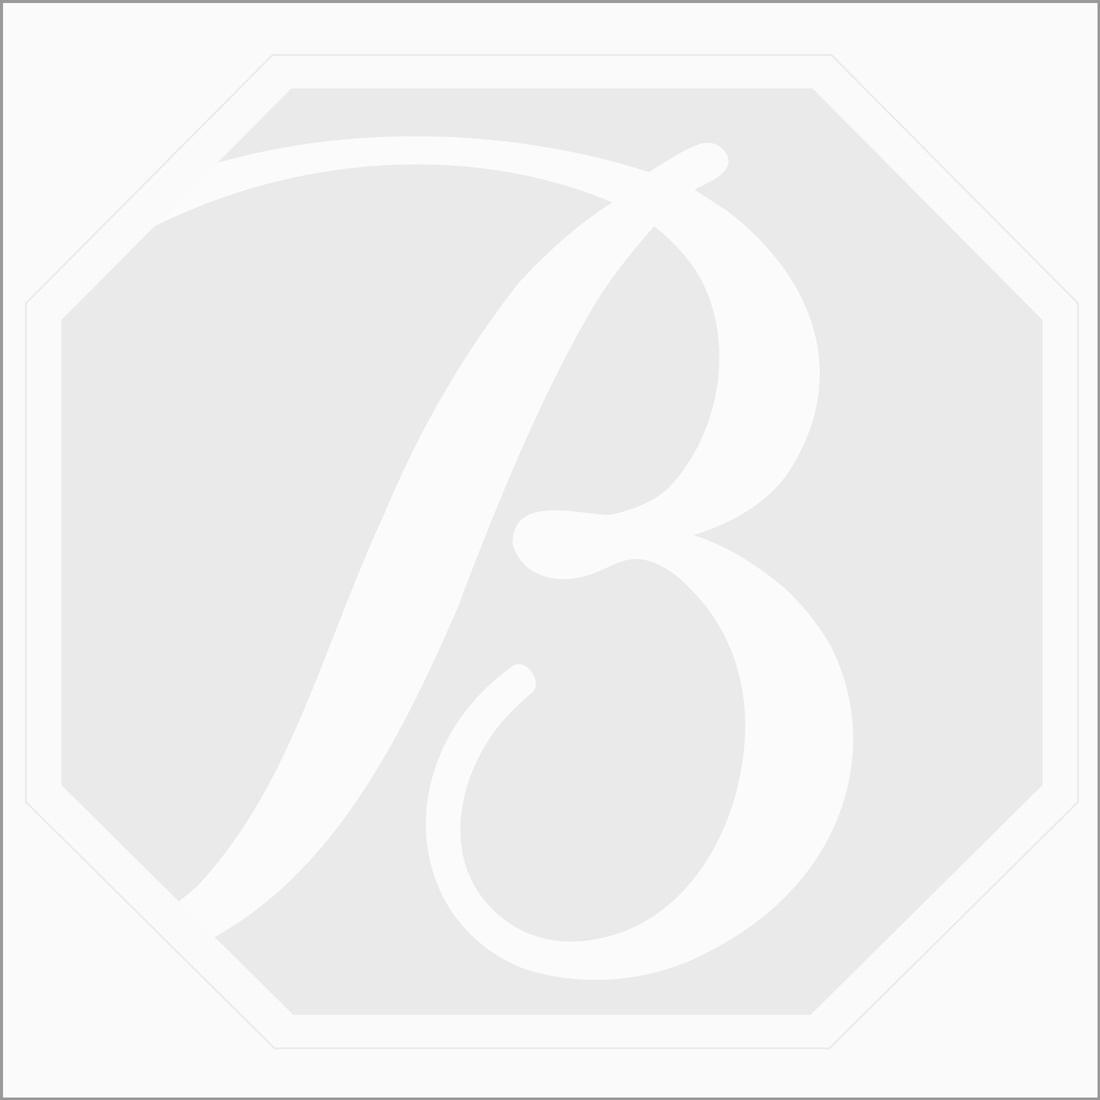 6.50 x 5 mm - Dark Gray Rose Cut Diamond Rectangle Shape - 1.76 carats (FncyDiaRC1038)